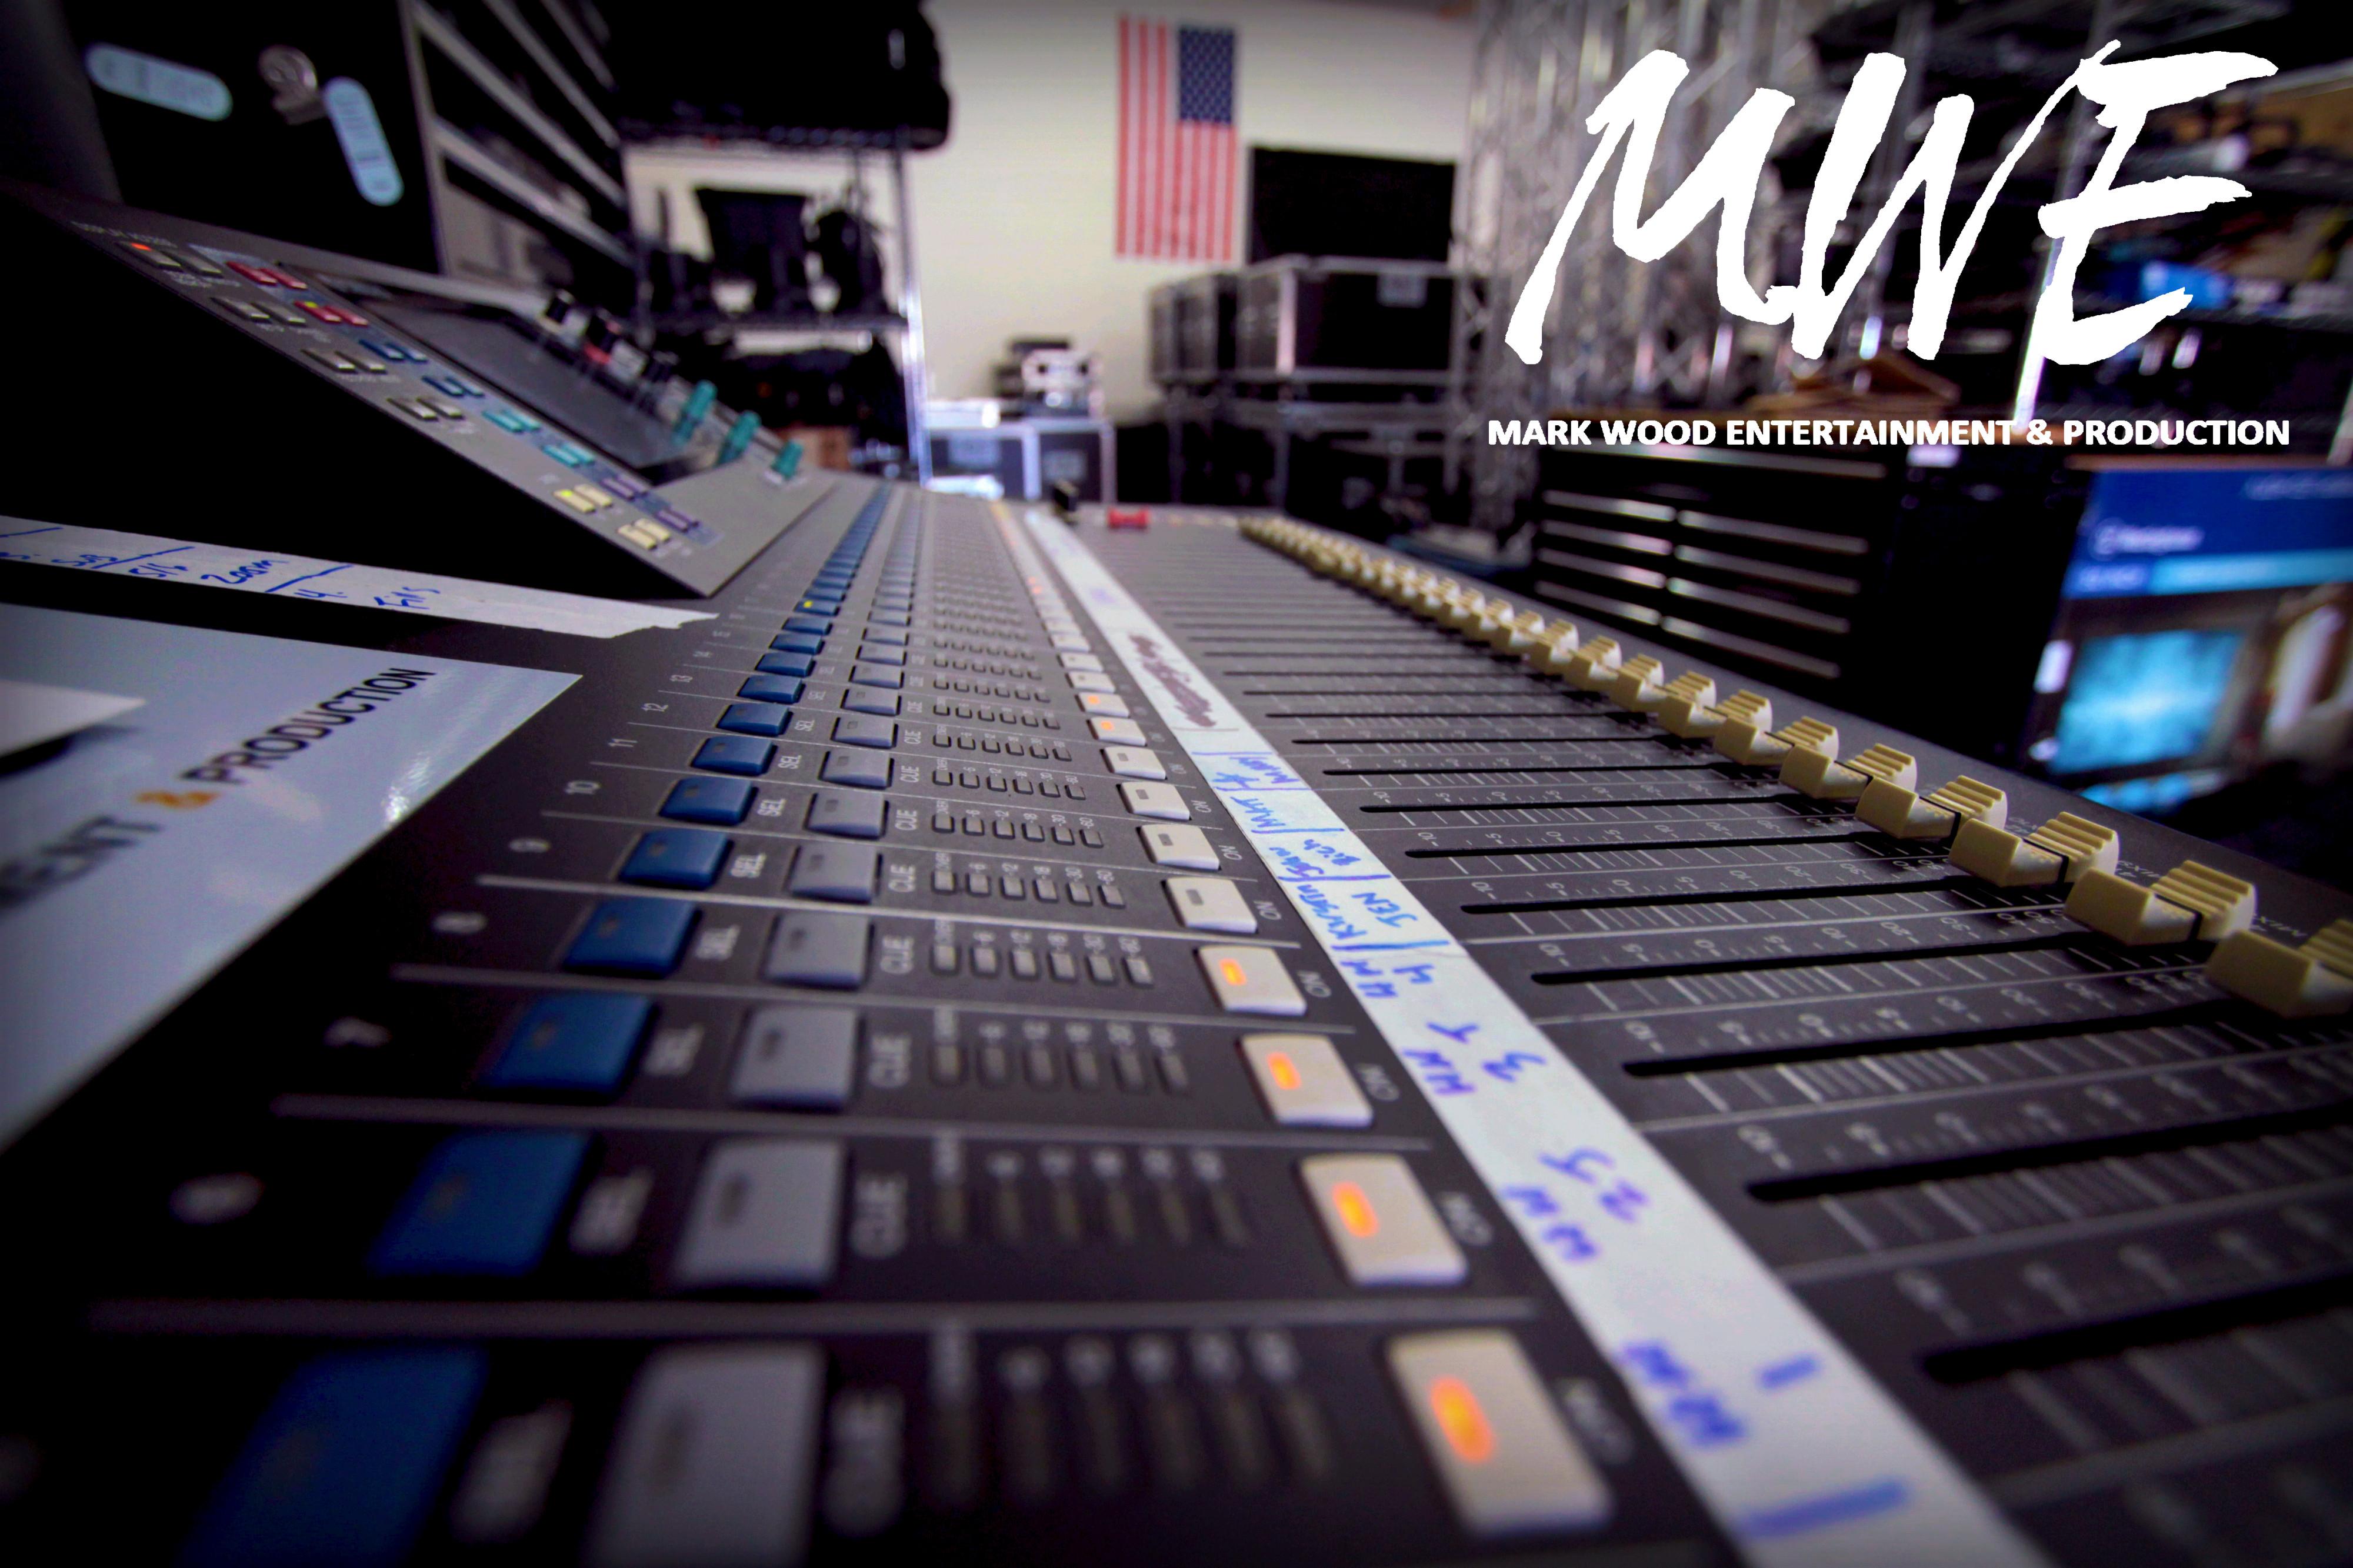 Warehouse Mixing Board MWE (2015_12_19 05_39_34 UTC)